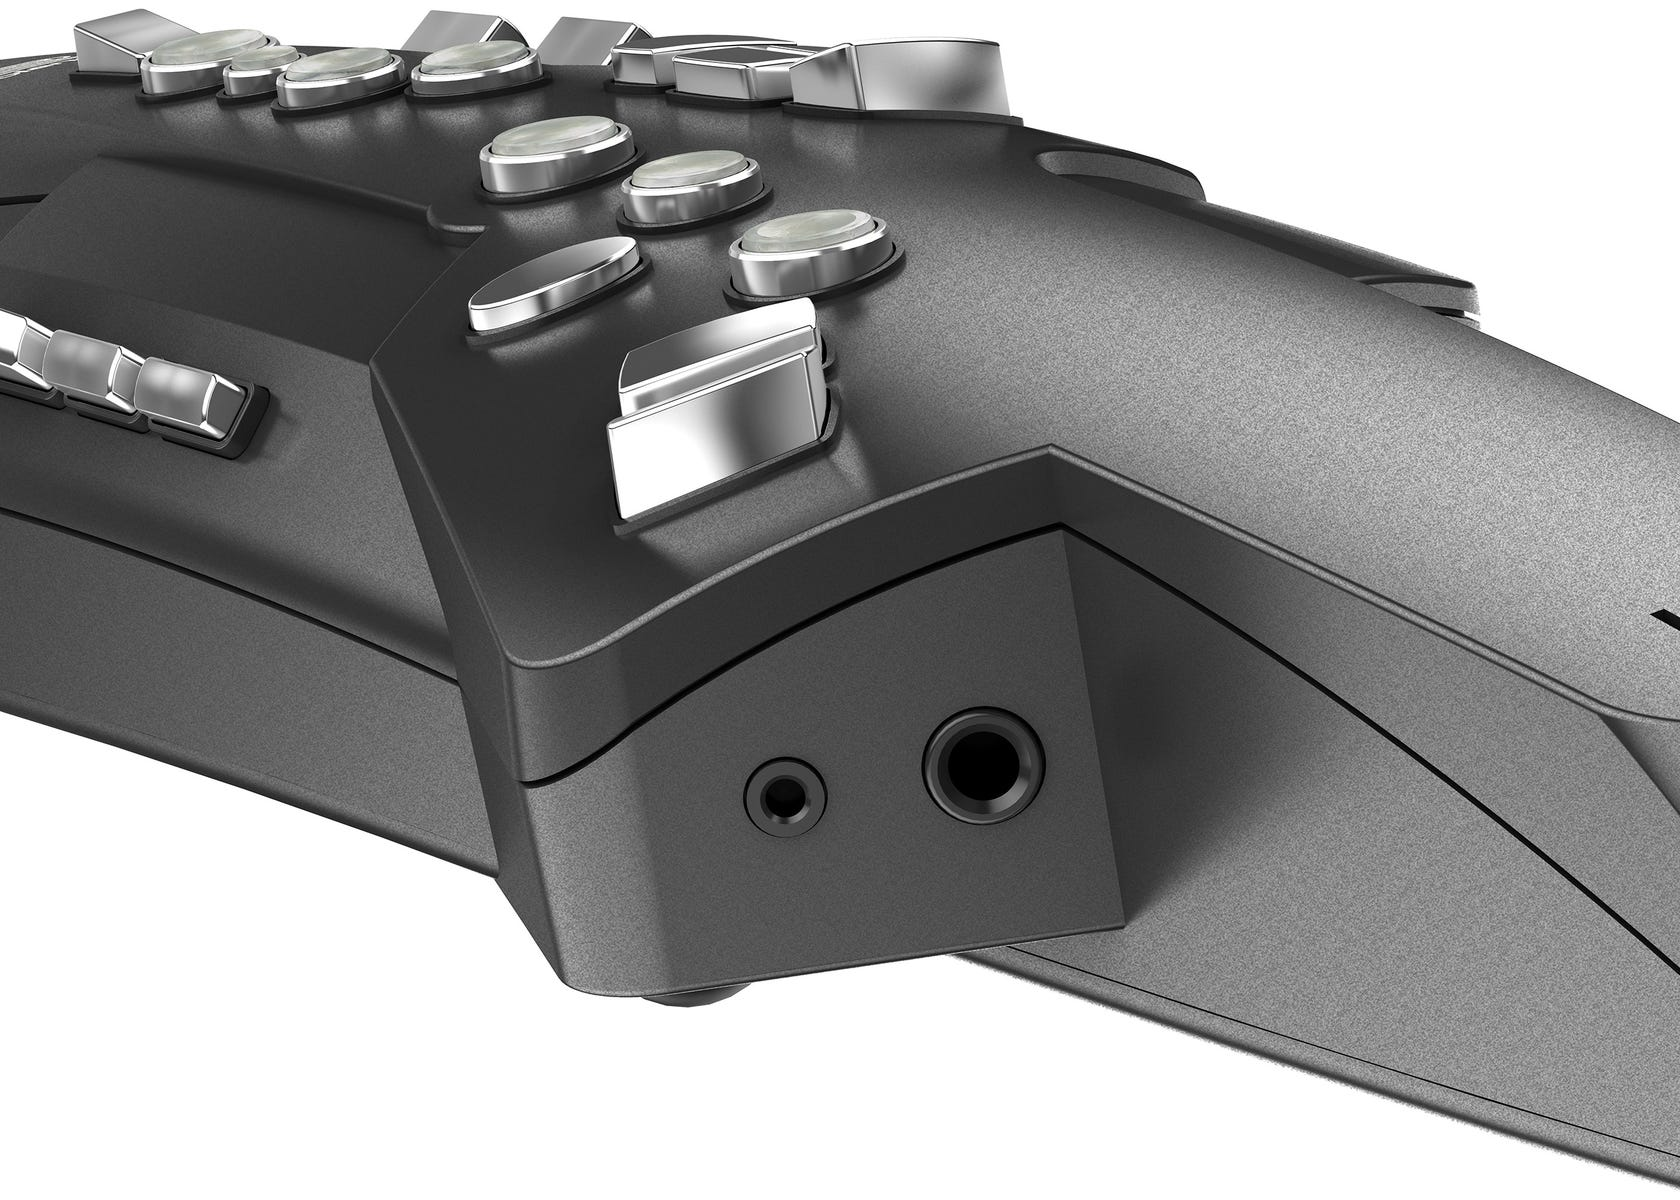 Roland AE10 Aerophone Digital Wind Instrument (AE-10) - Graphite Black